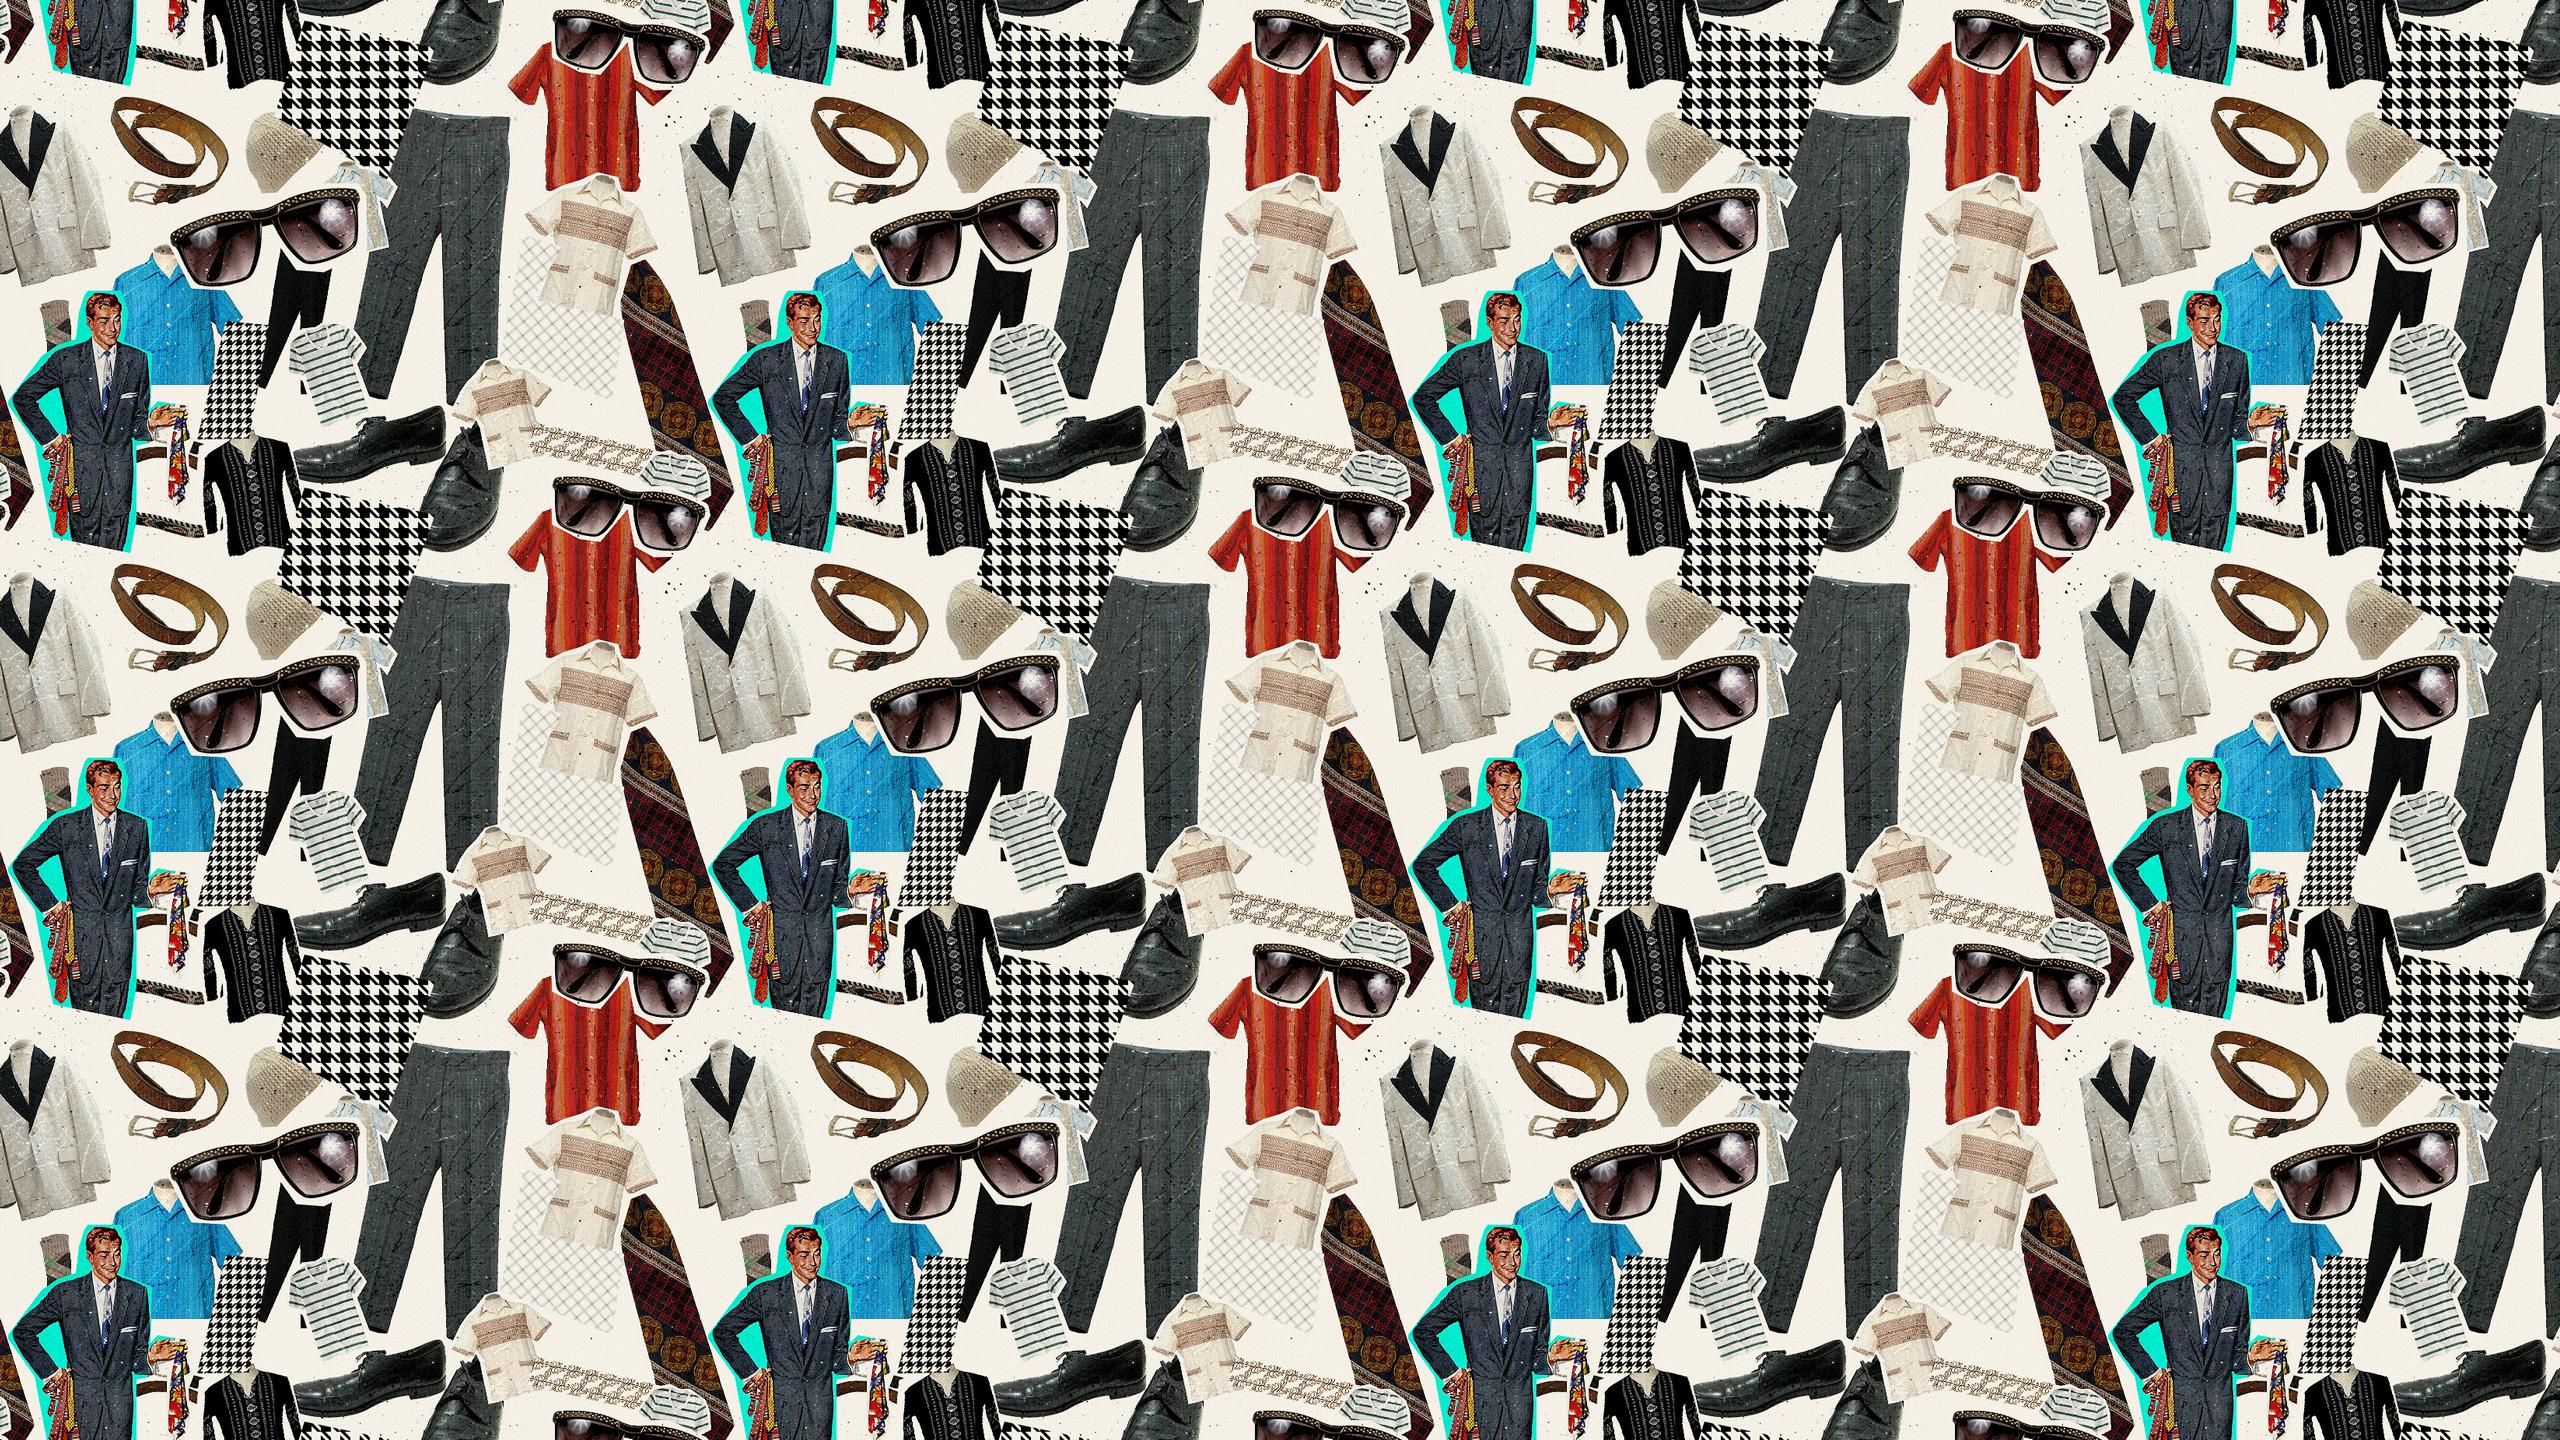 vintage fashion desktop wallpaper share on tumblr